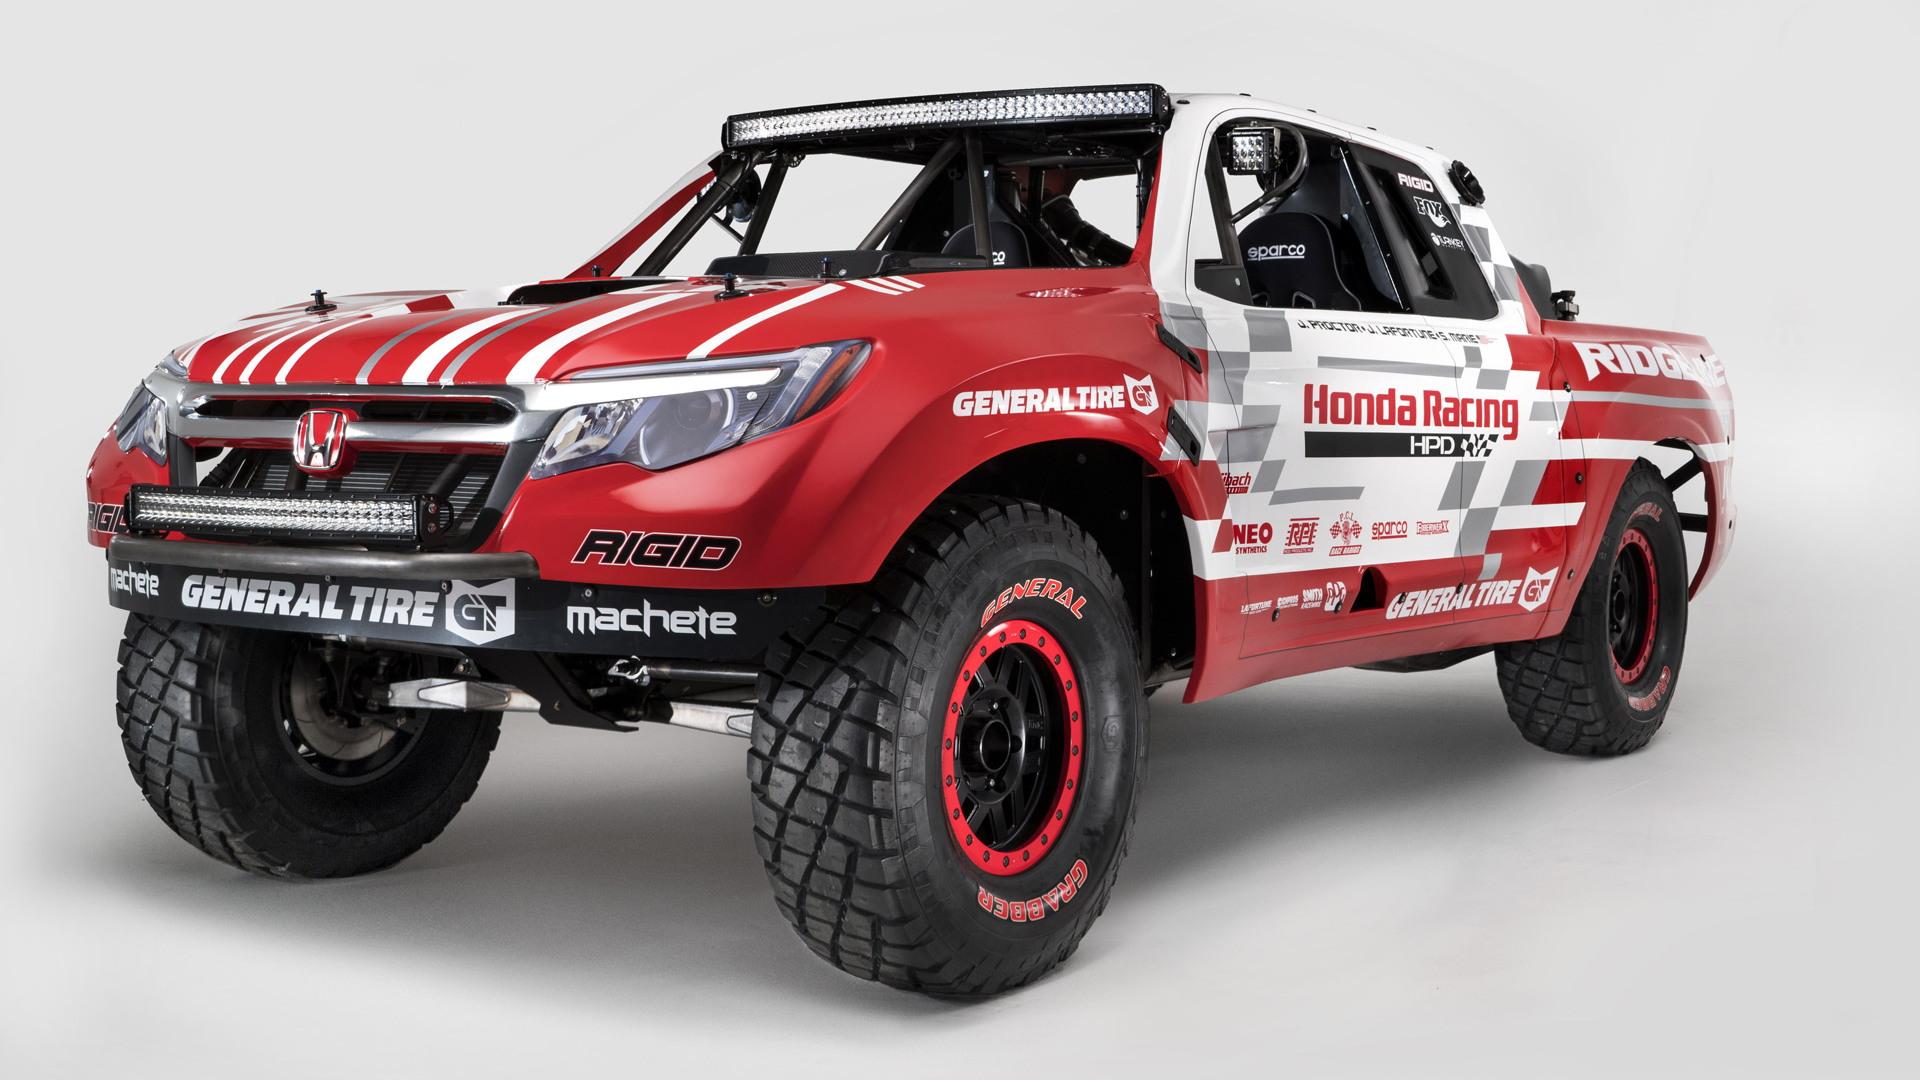 Honda Ridgeline Desert Race Truck, 2015 SEMA show